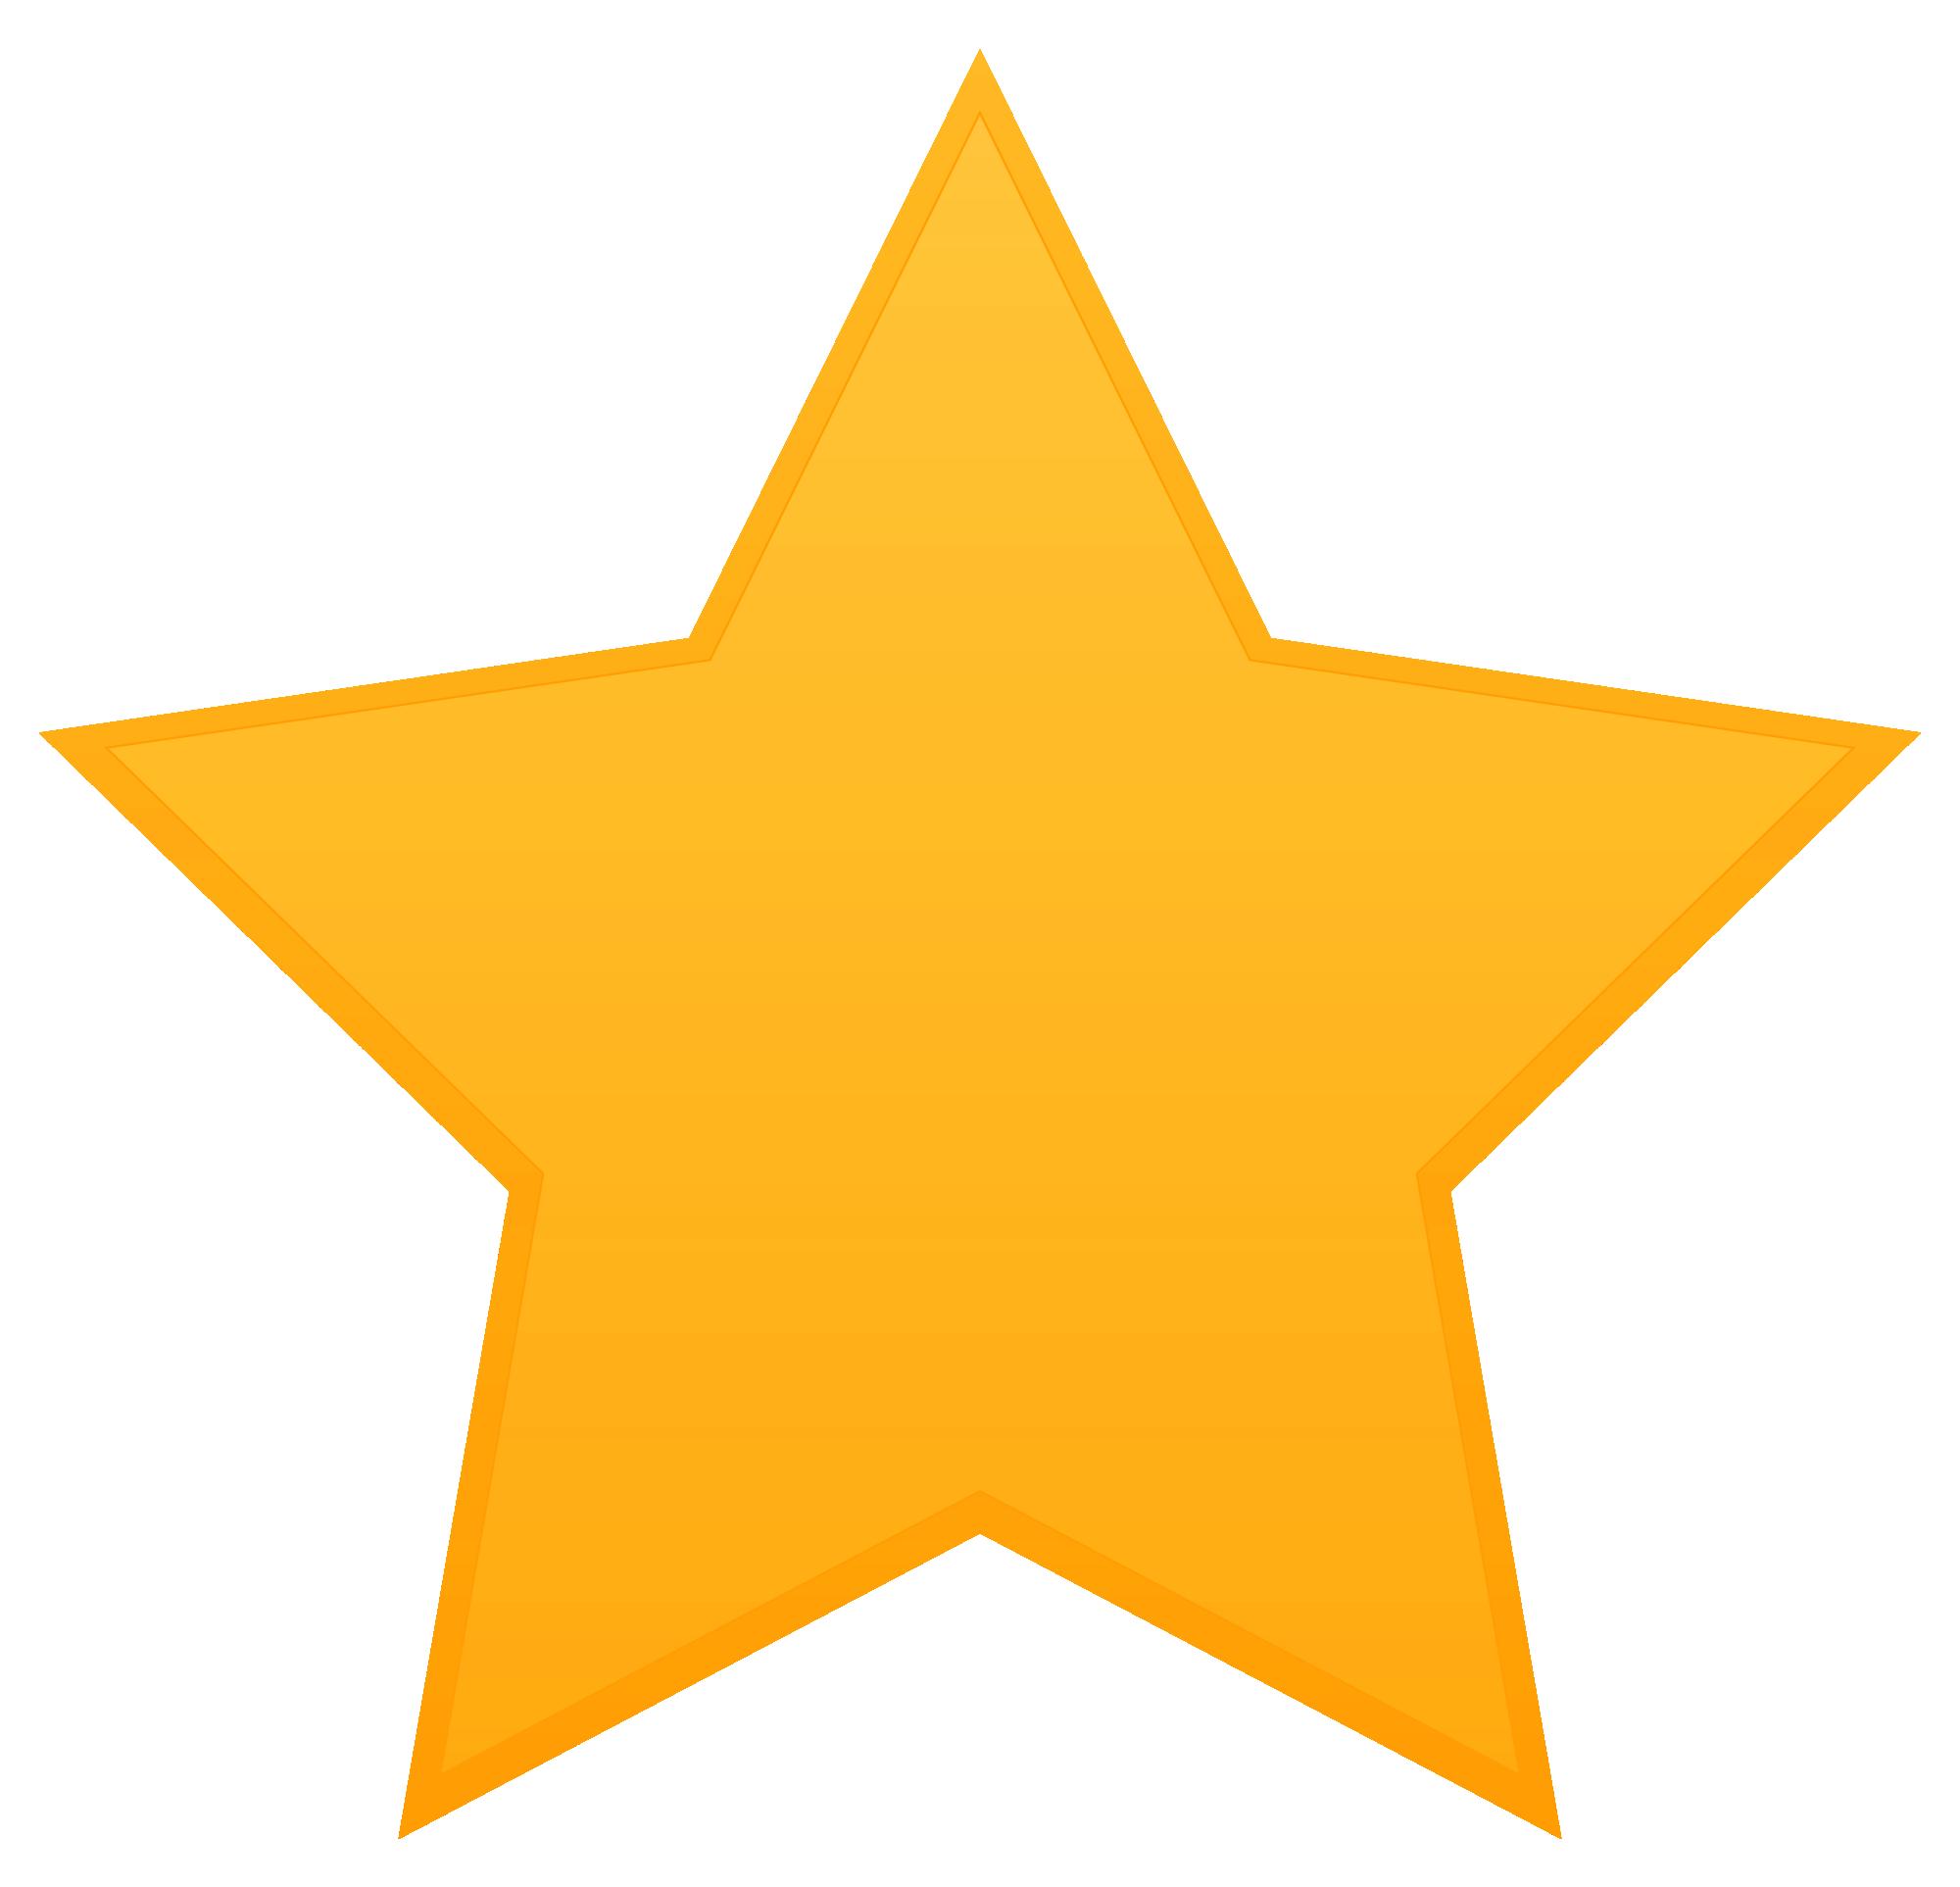 2000x1925 Orange Star Vector Svg Freeuse Stock